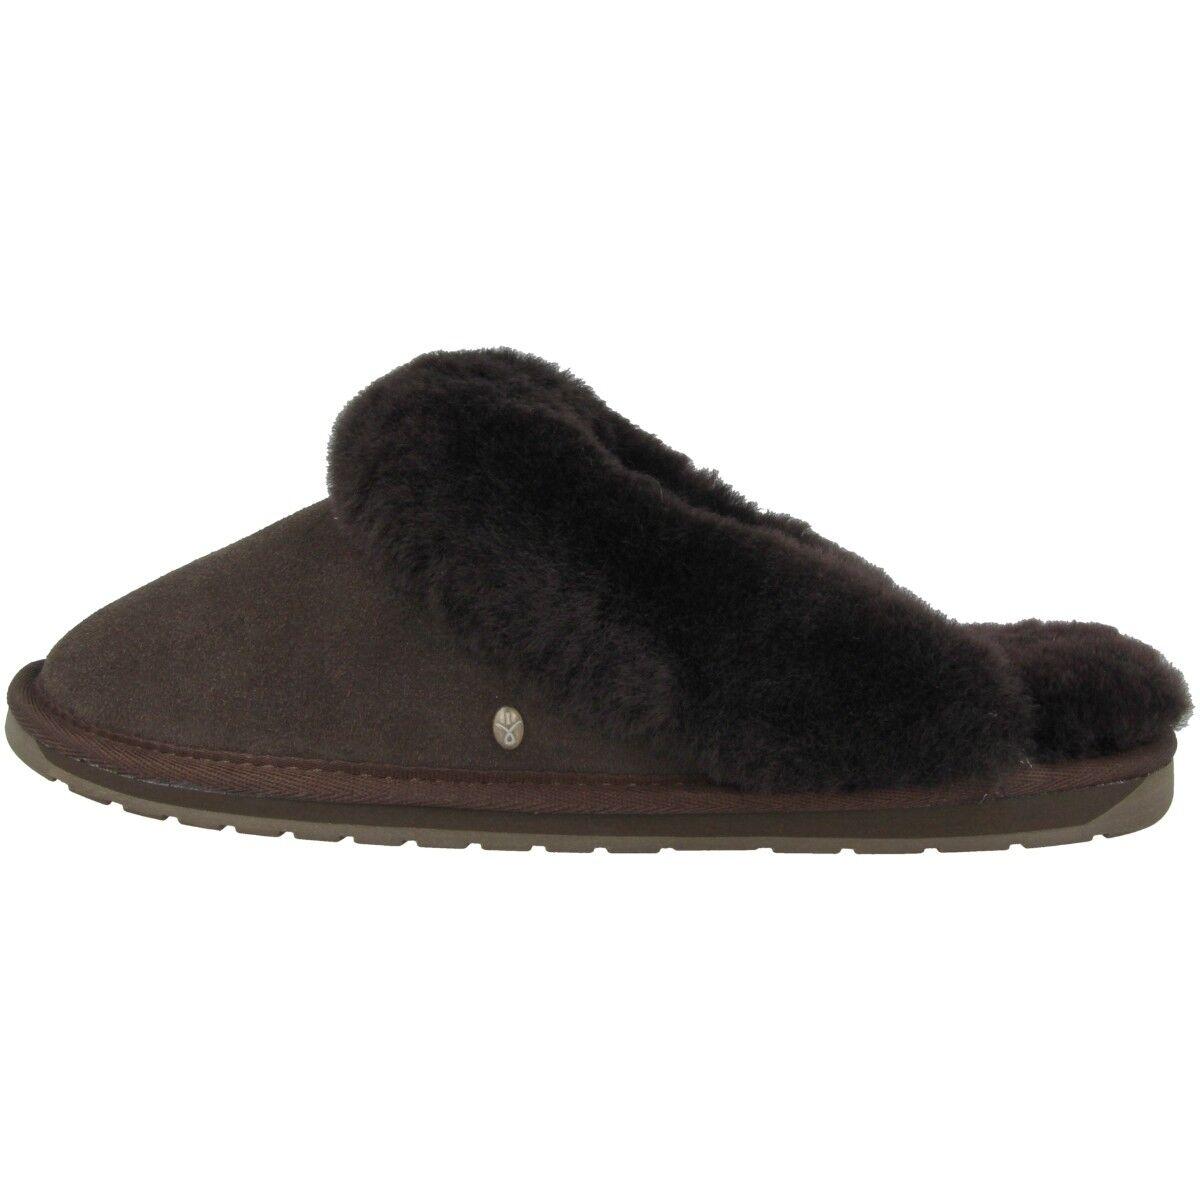 Emu Australia Jolie W Chaussures Chaussons Femmes Pantoufles CHOCOLATE w10015-e011